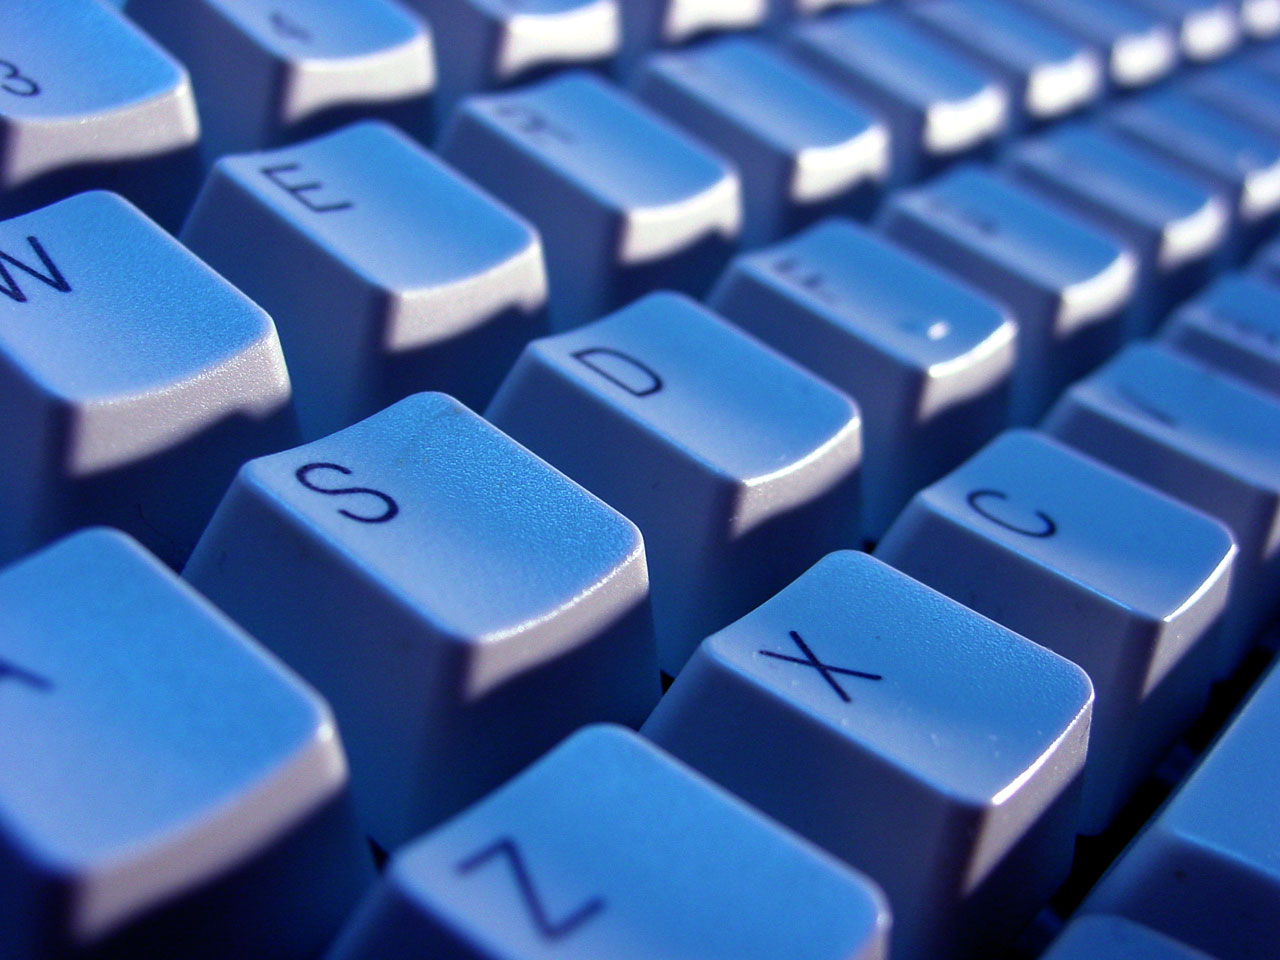 CIS Keyboard